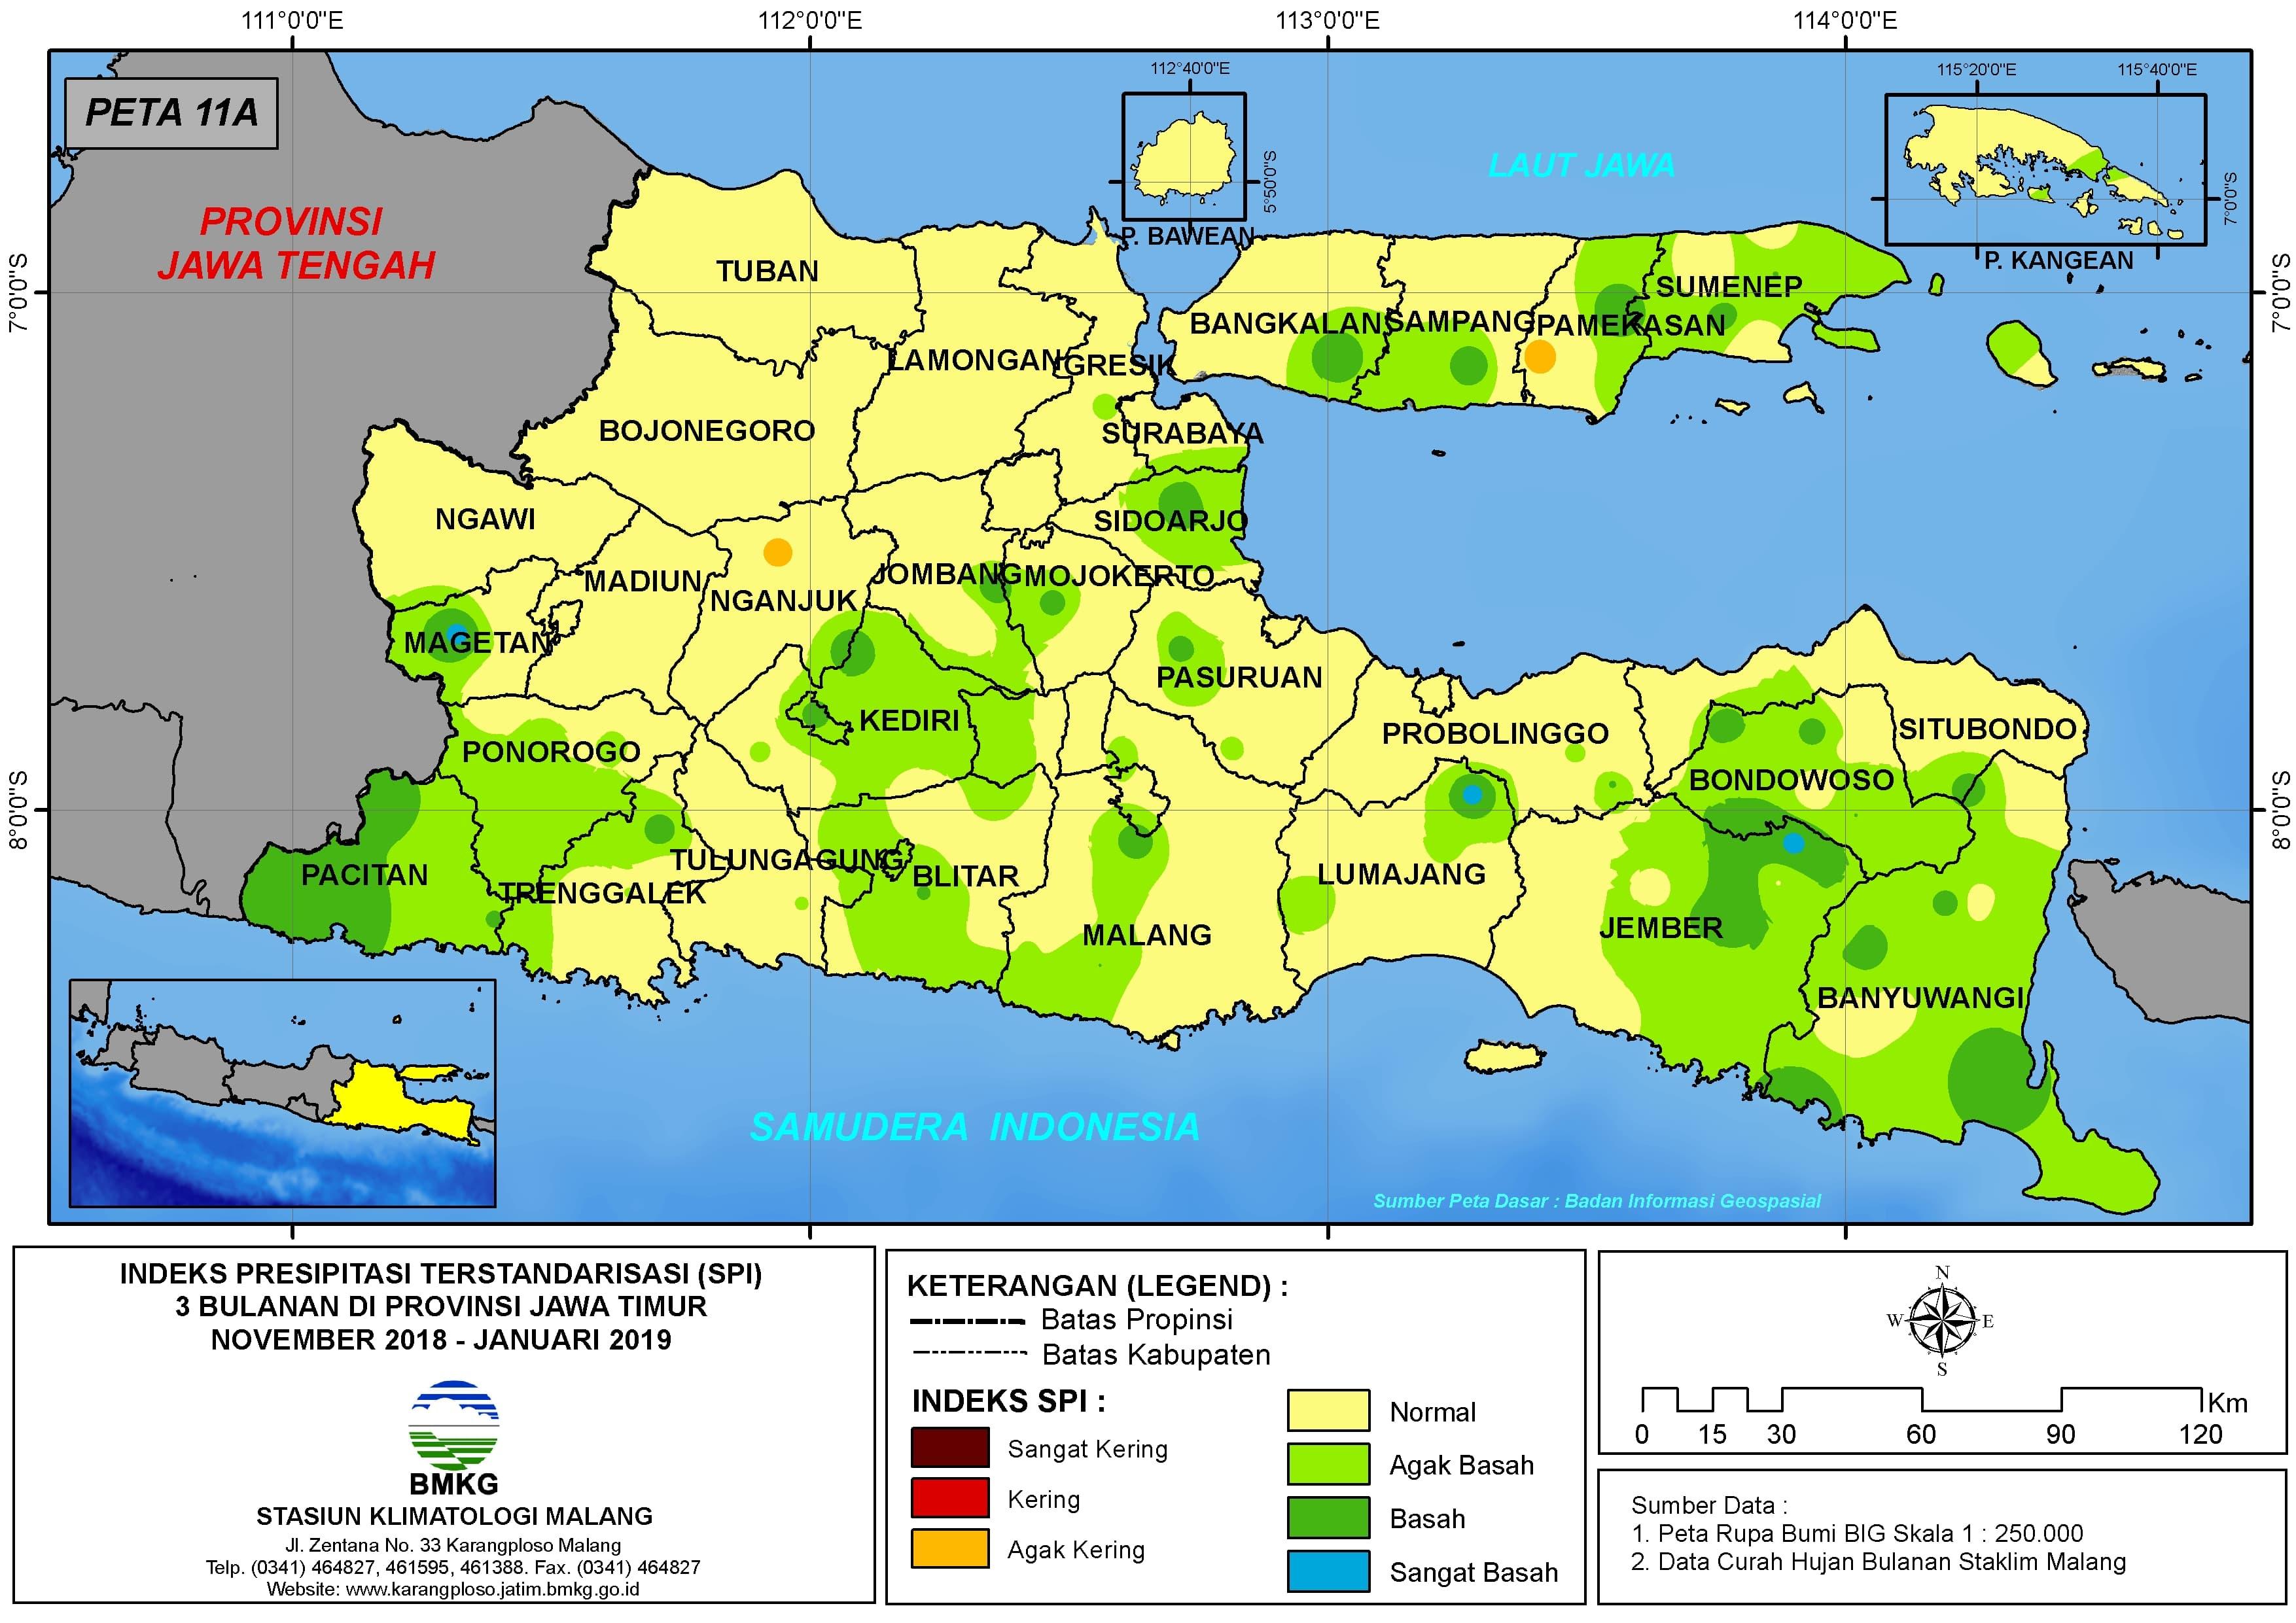 Analisis Indeks Presipitasi Terstandarisasi (SPI) 3 Bulanan Bulan November Desember Tahun 2018 Bulan Januari Tahun 2019 di Provinsi Jawa Timur